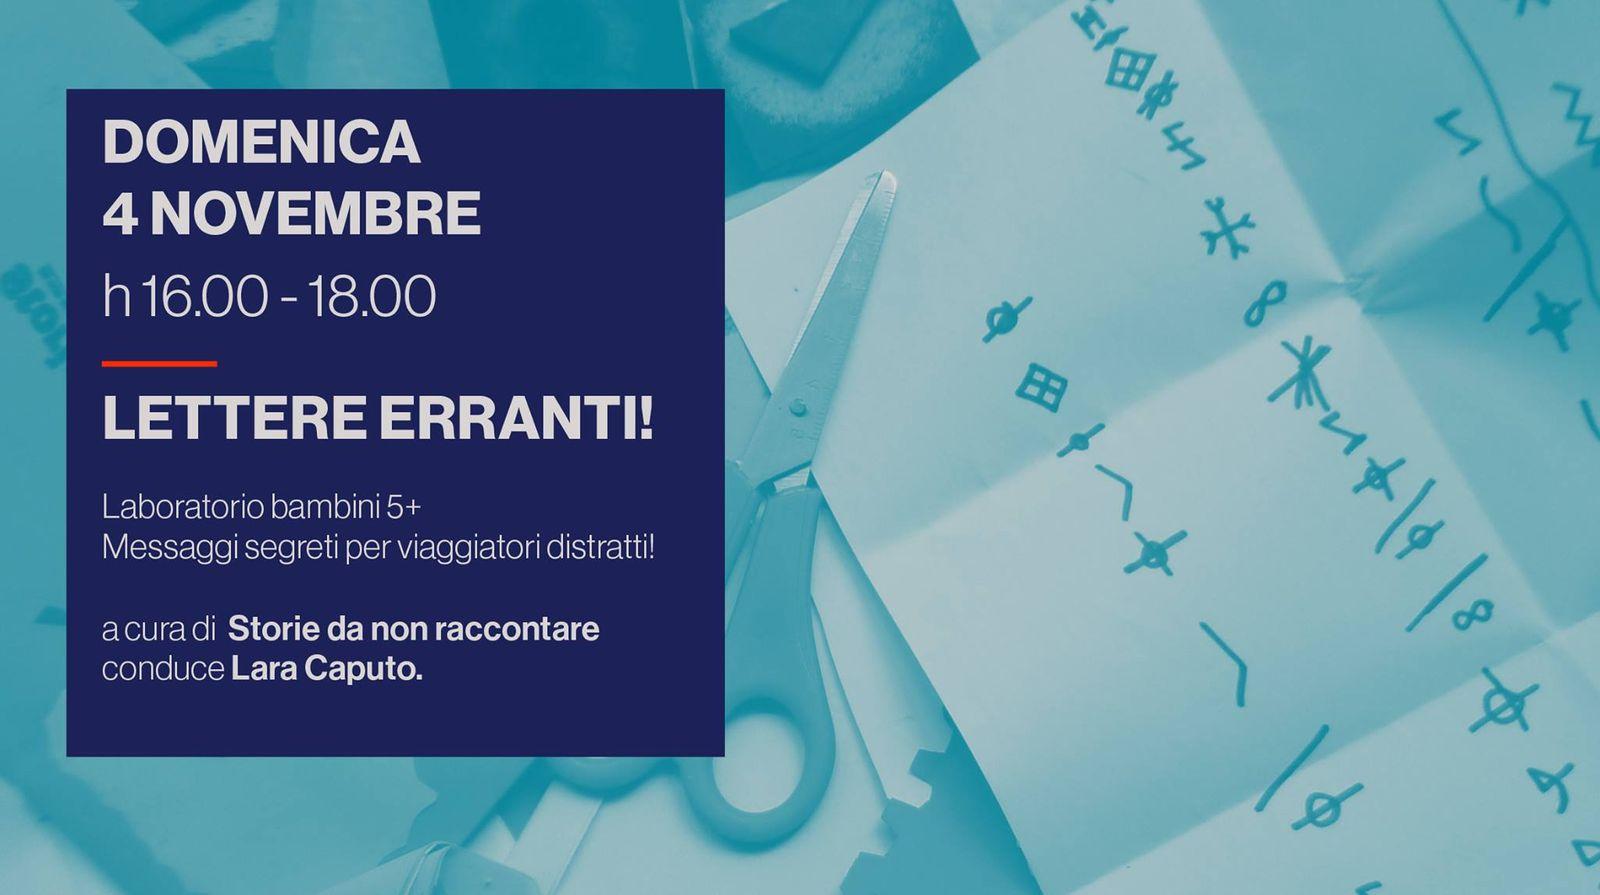 Workshop per bambini - Lettere erranti!